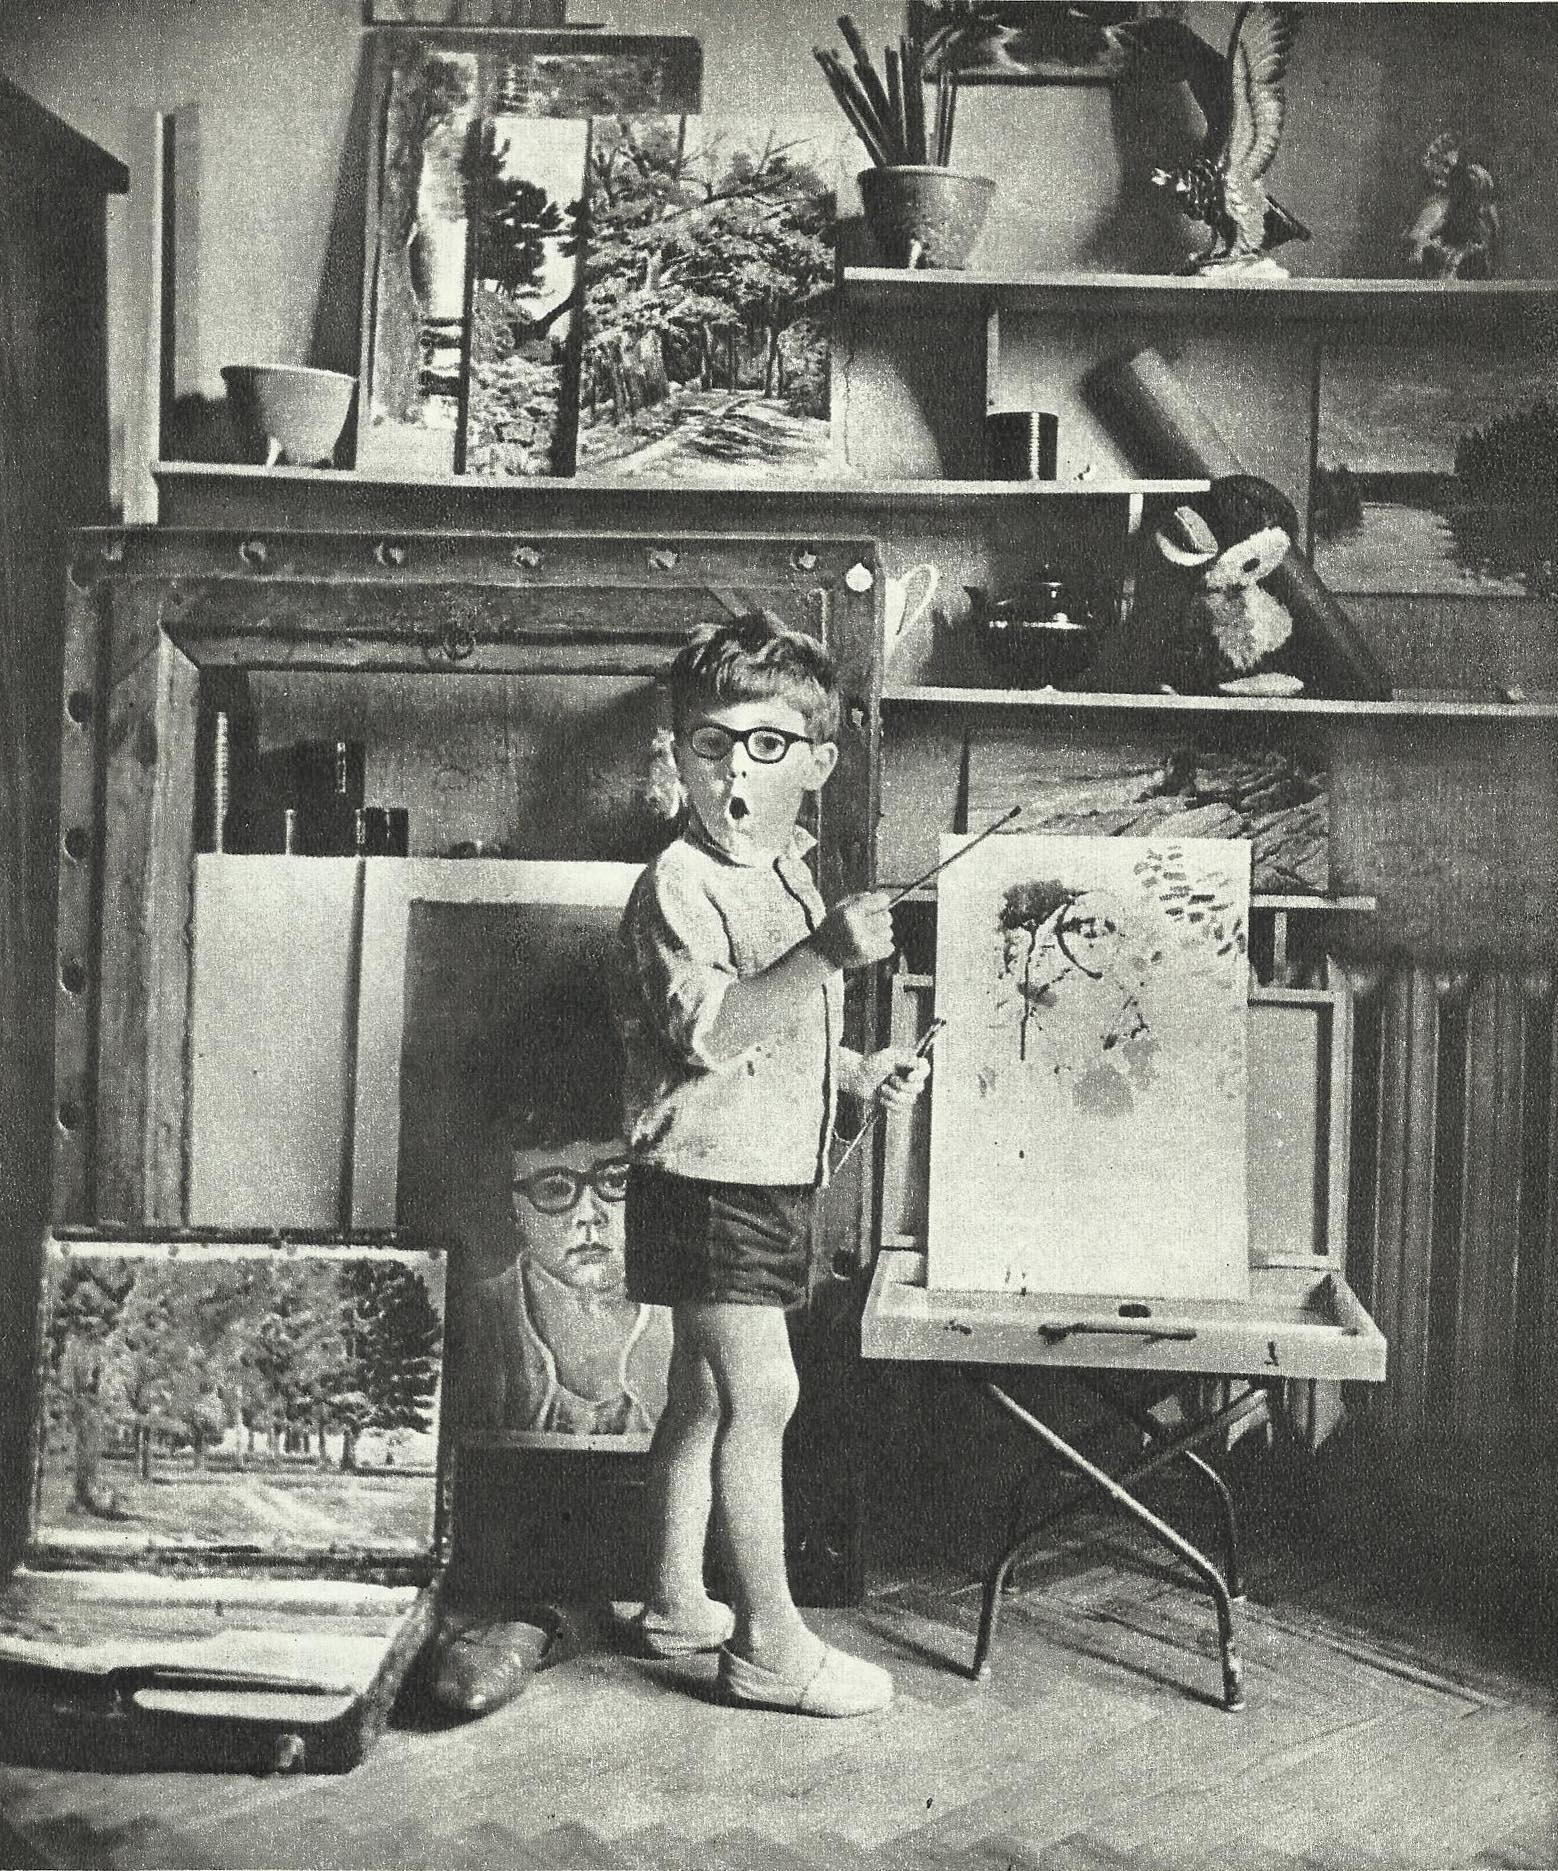 Советское ретро фото 9 фотография